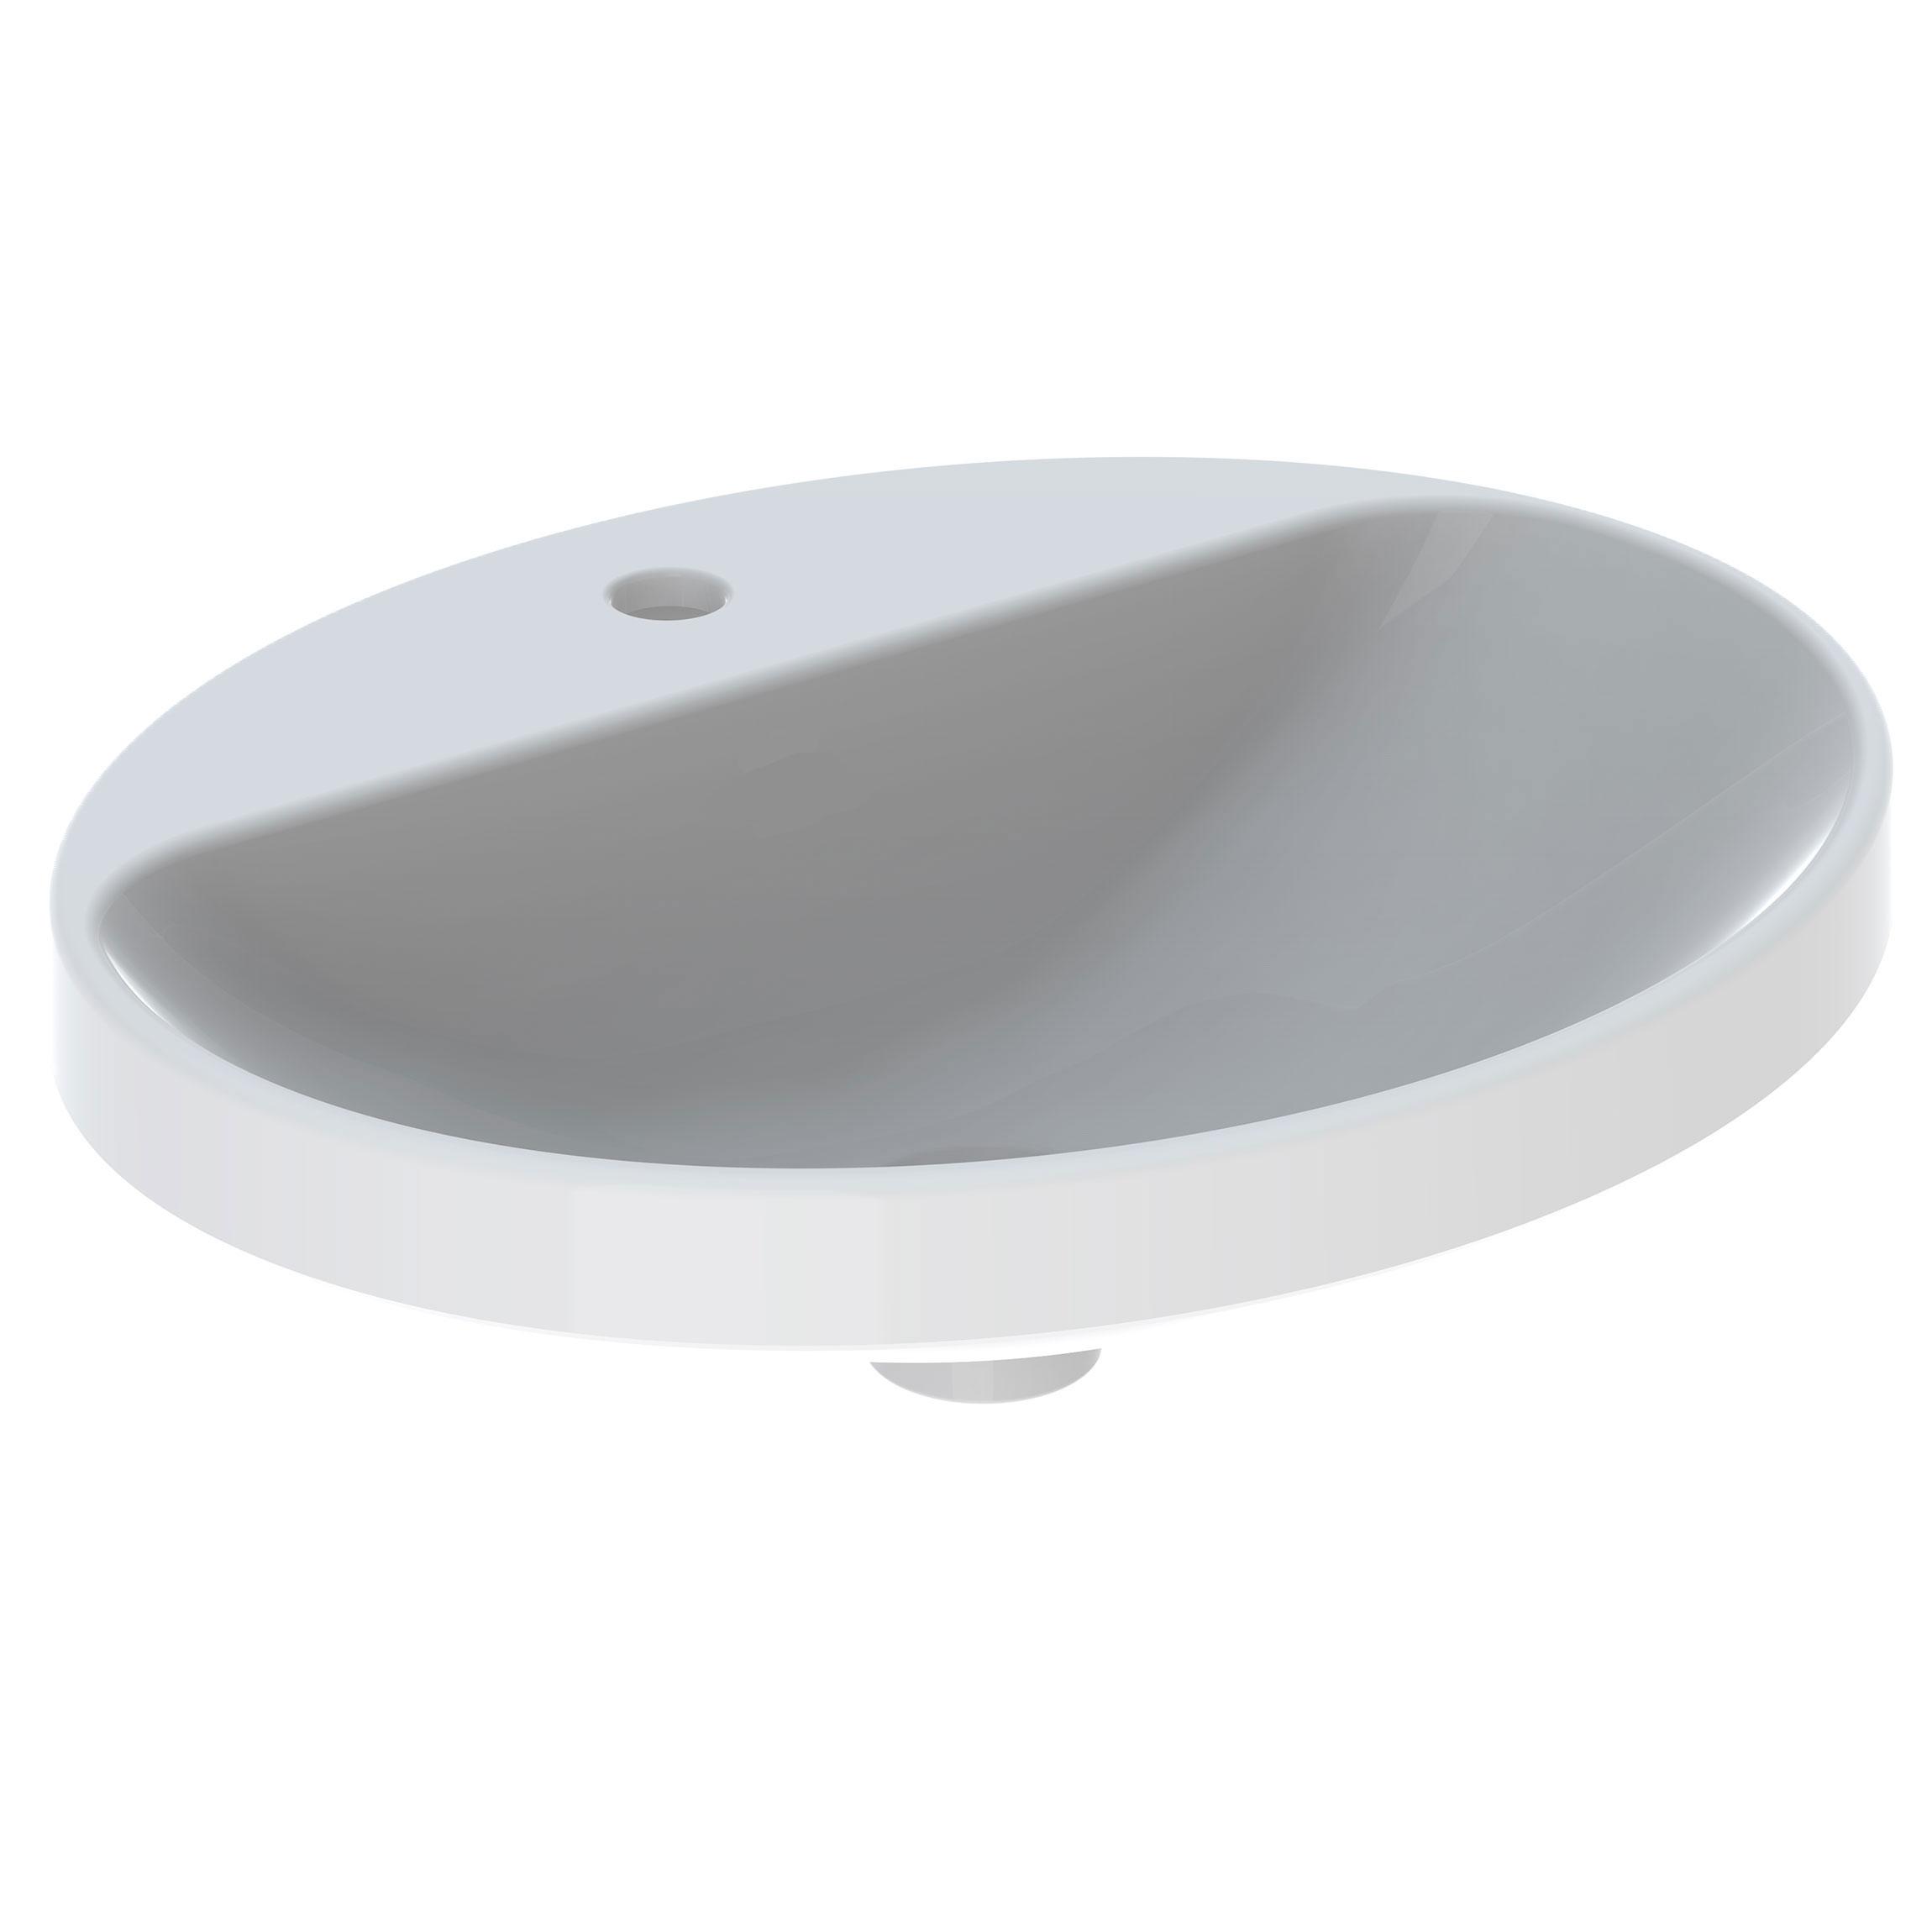 Tvättställ Geberit Variform 550 mm Infälld Ovalt Kanthylla